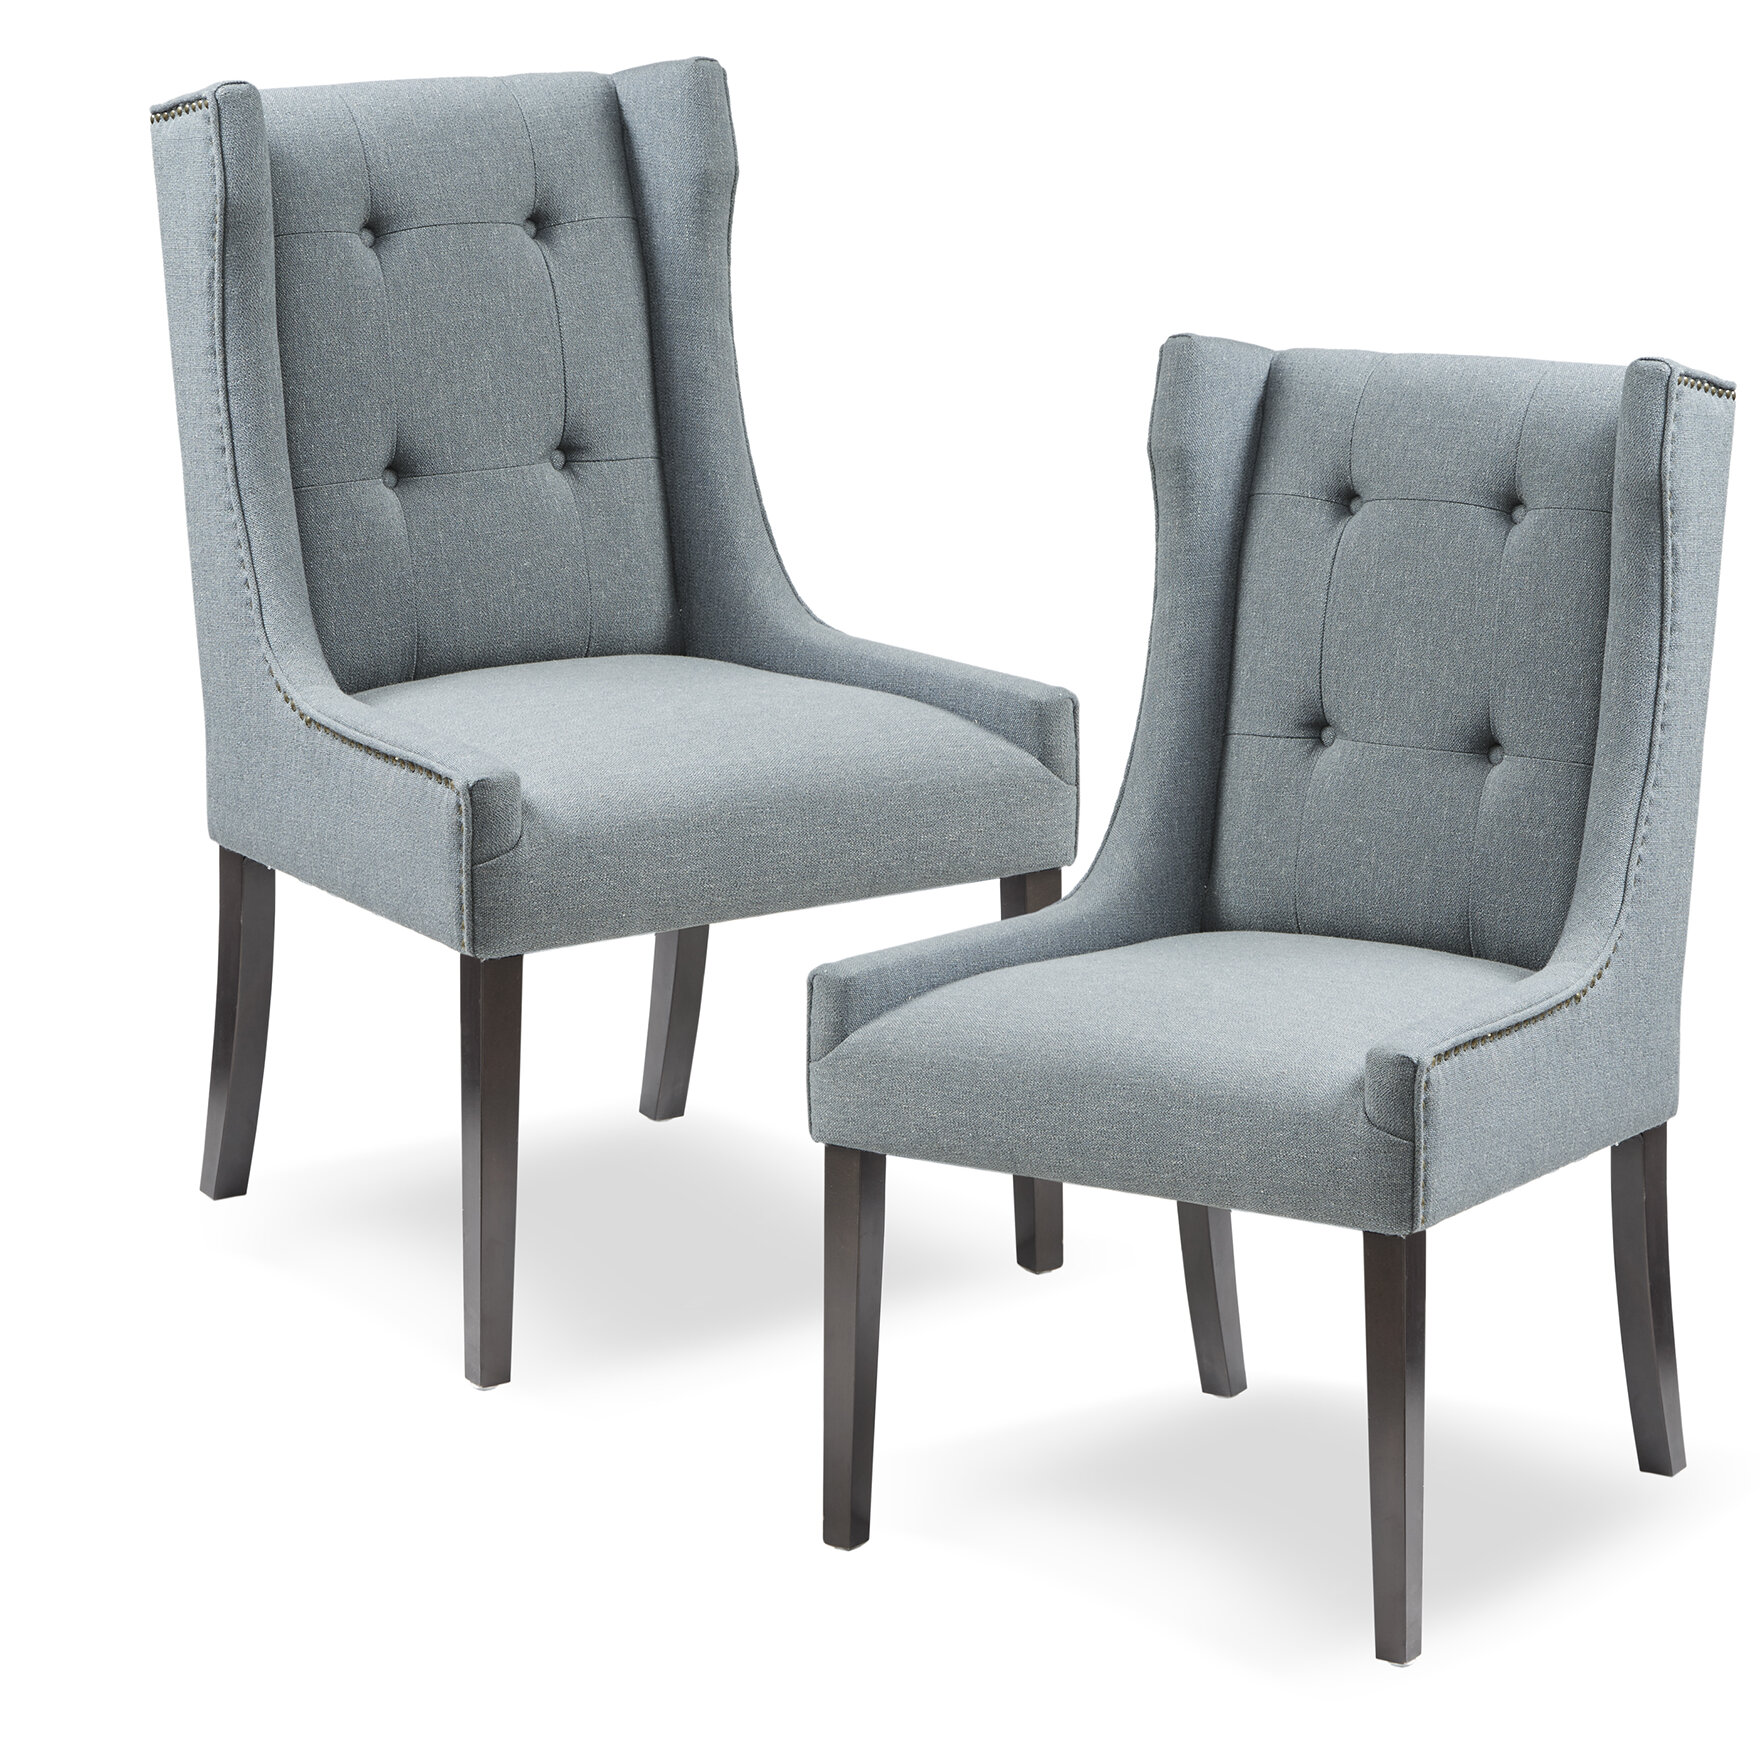 Charlton home gunnar upholstered dining chair wayfair